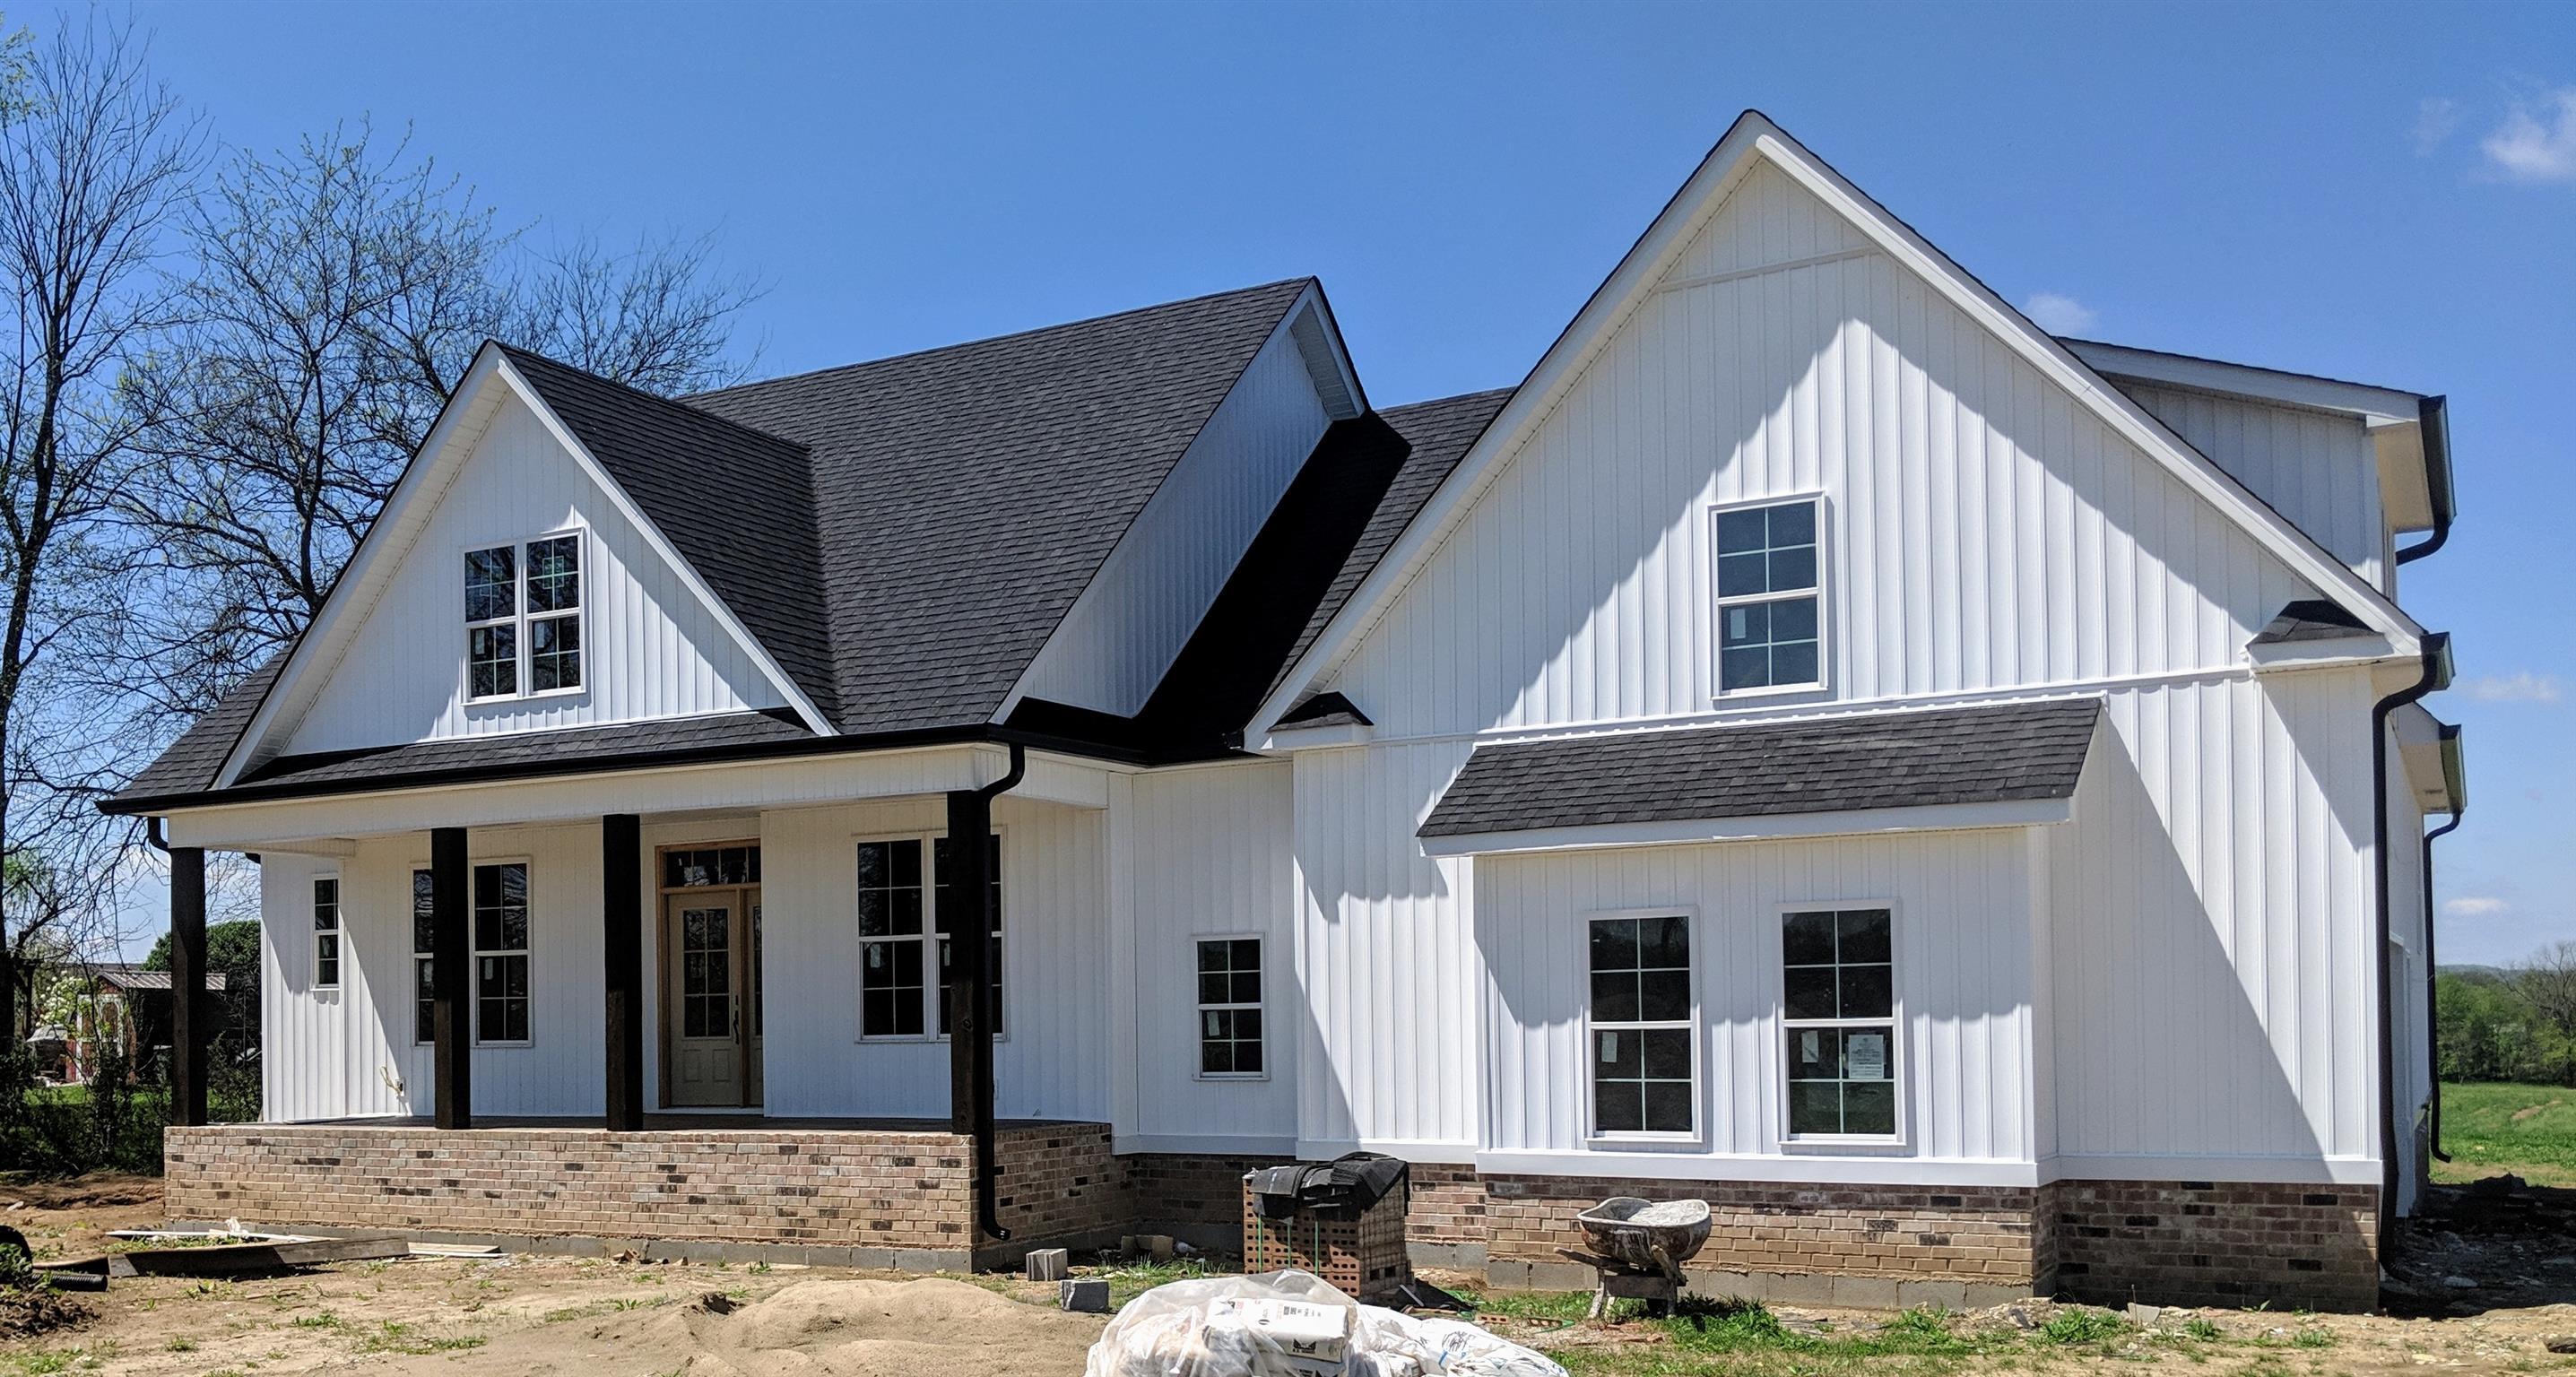 569 greenfield lane, Castalian Springs, TN 37031 - Castalian Springs, TN real estate listing